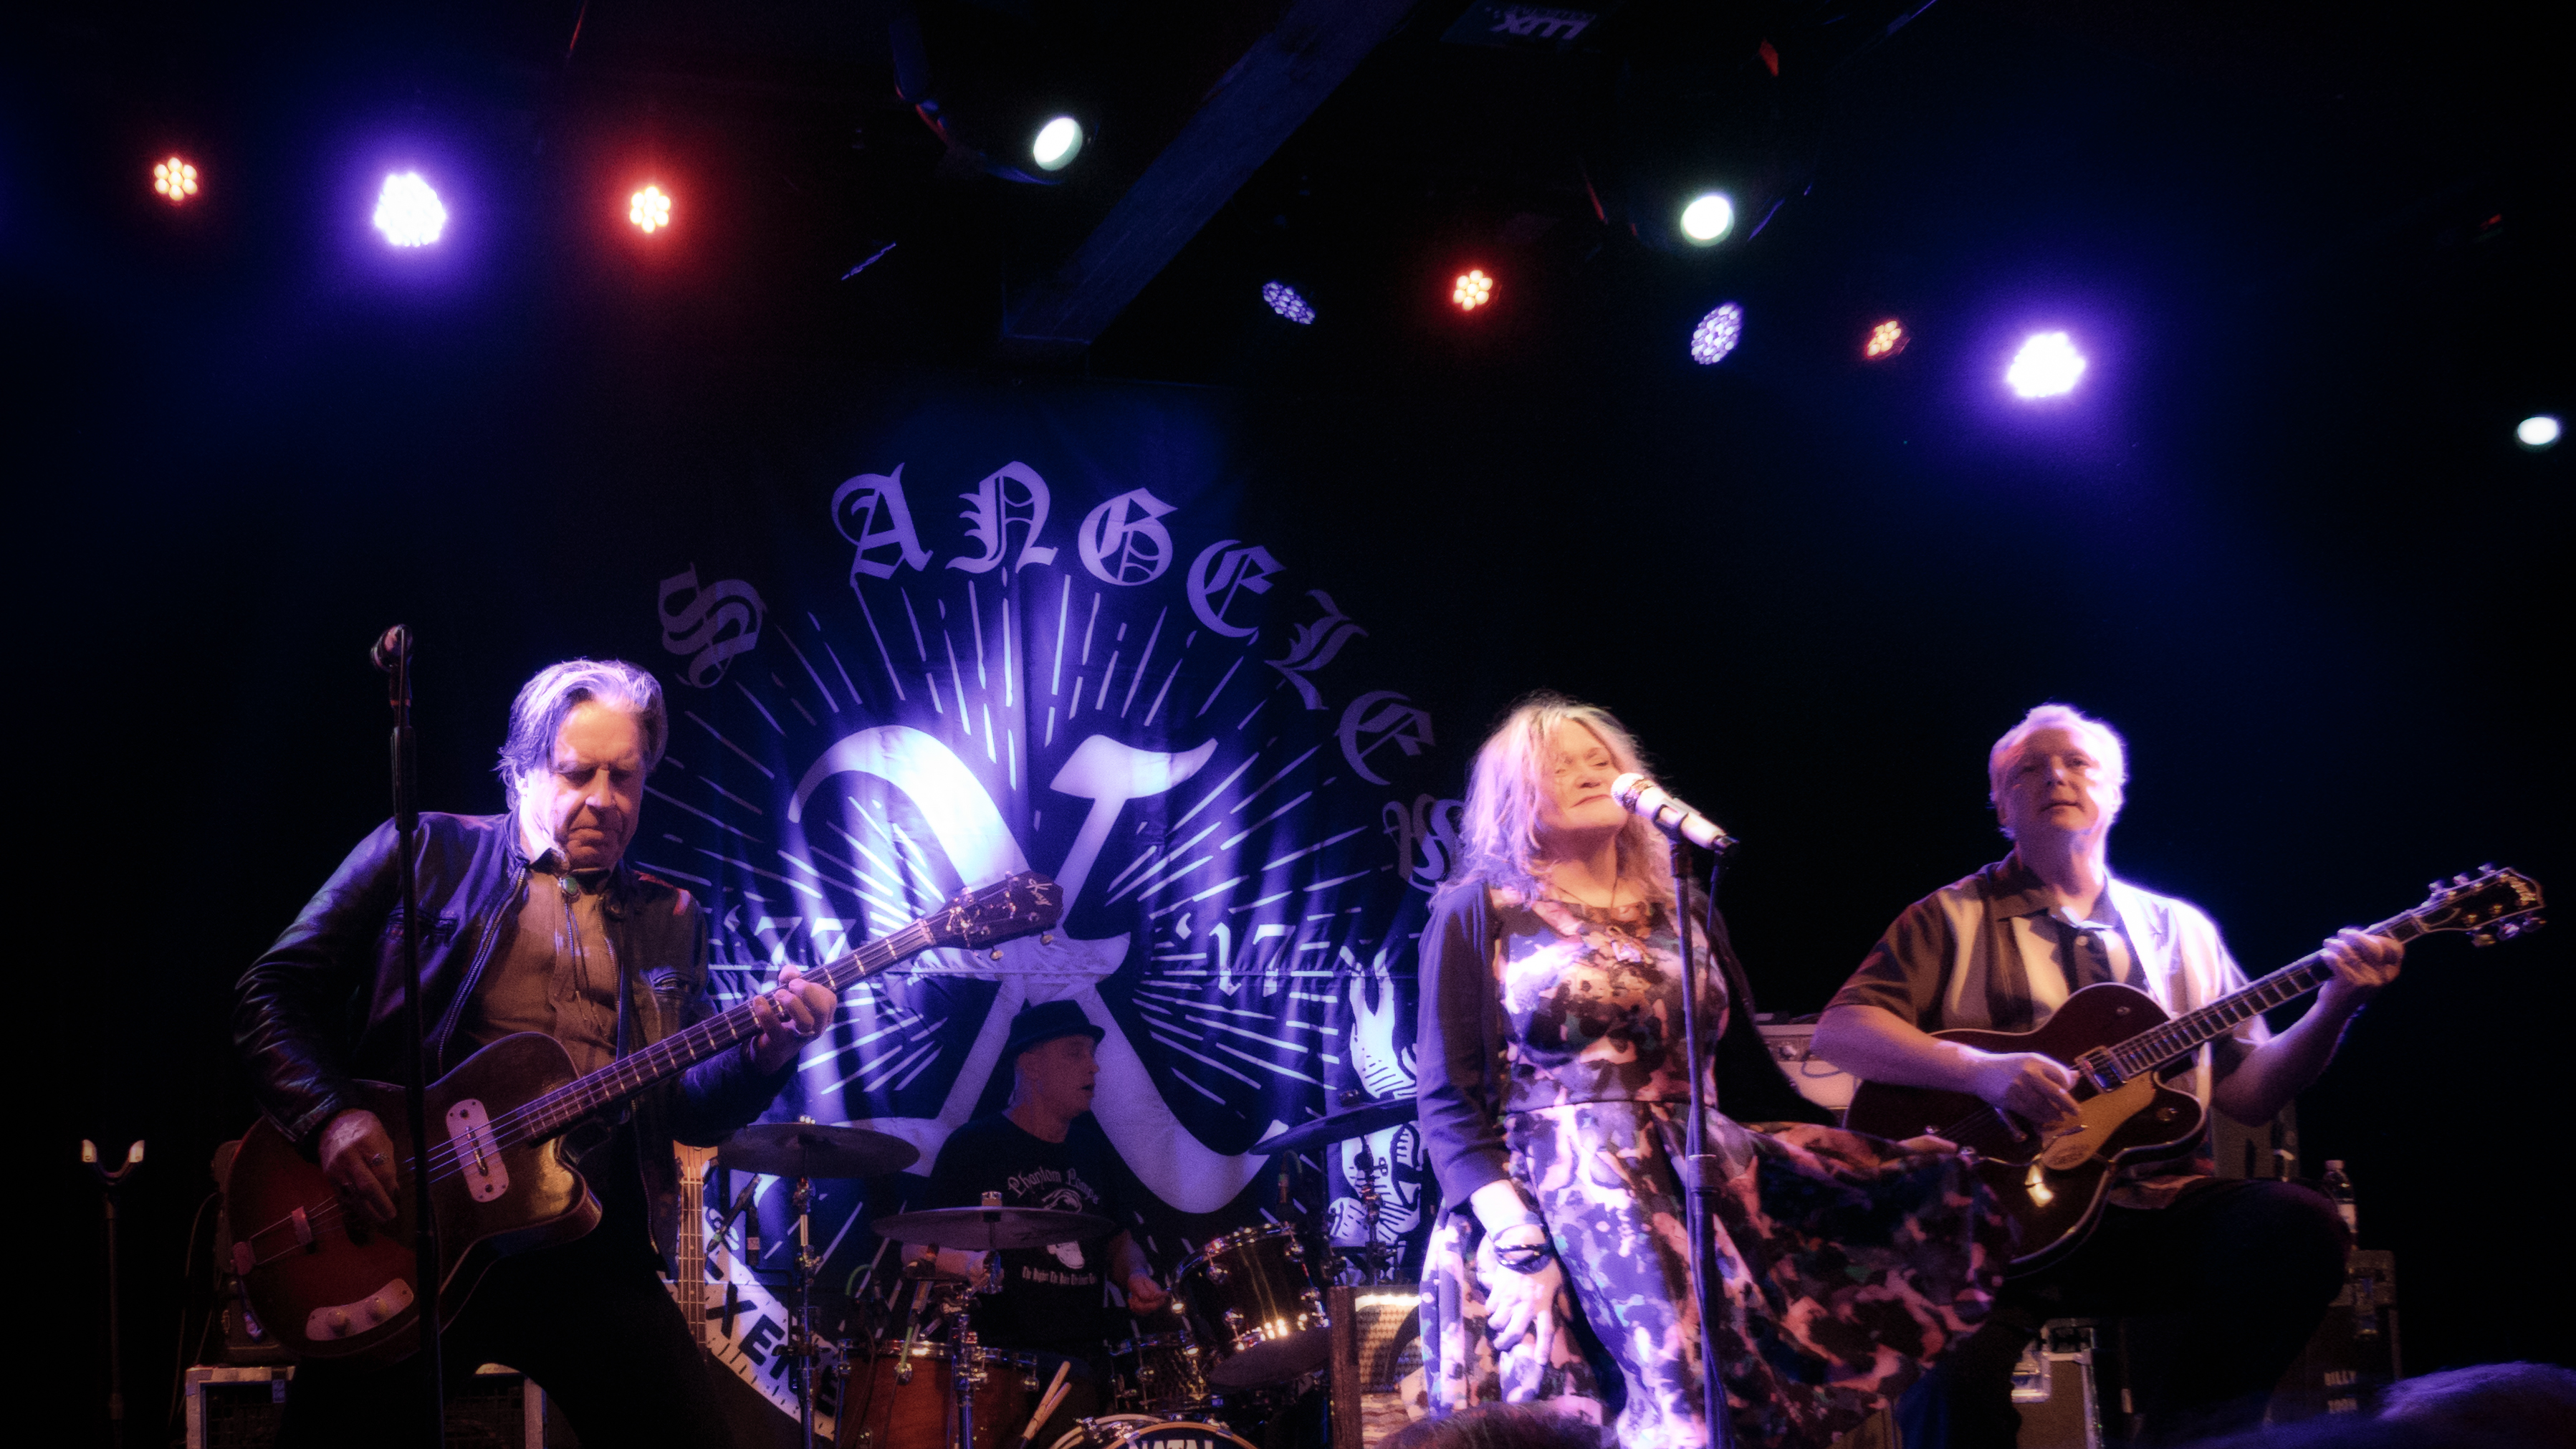 X American band   Wikipedia